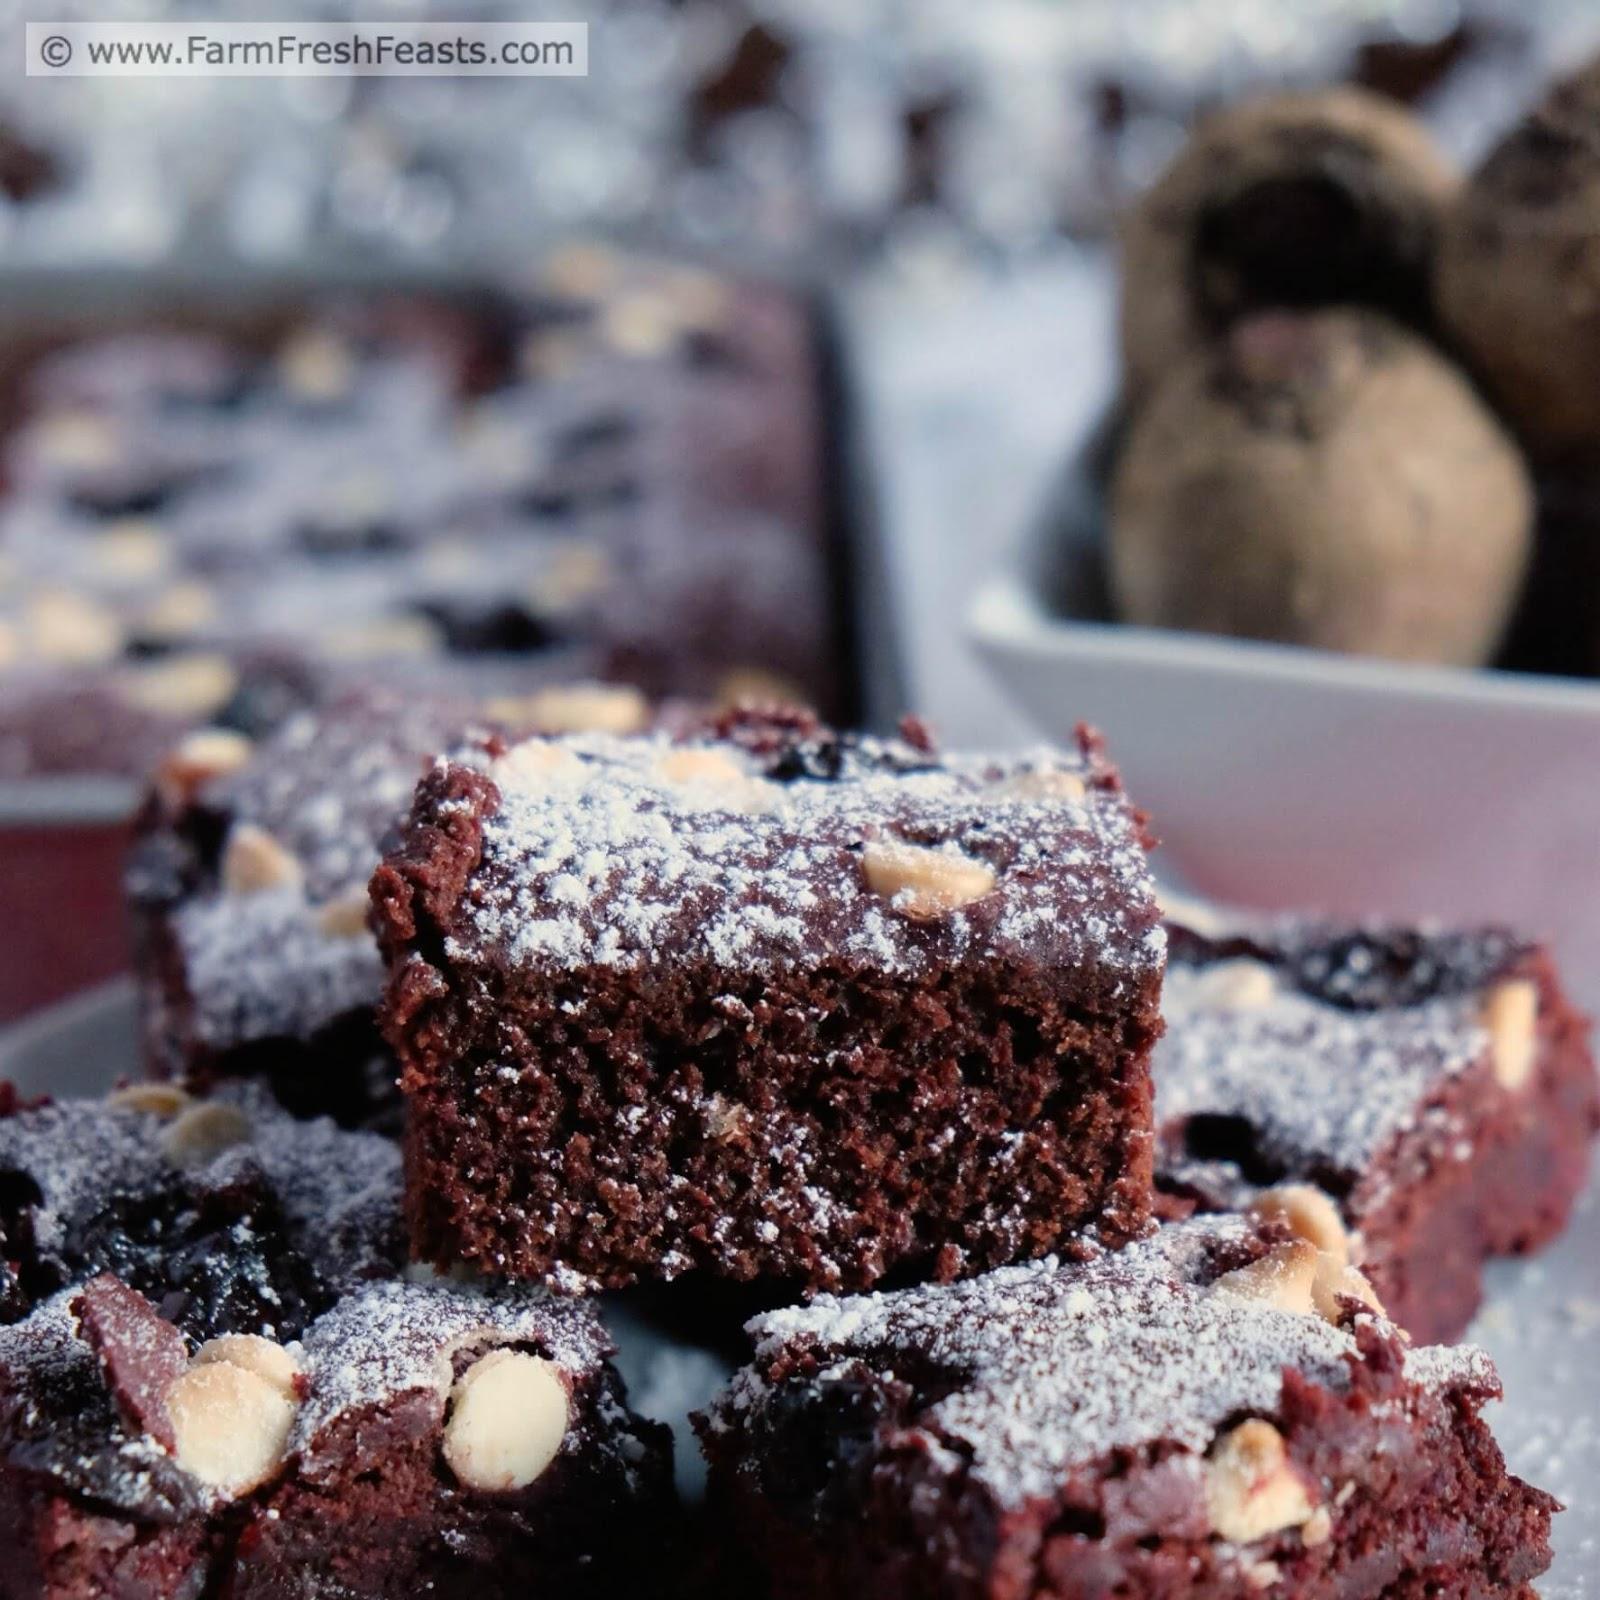 Farm Fresh Feasts: Chocolate Cherry Beet Brownies